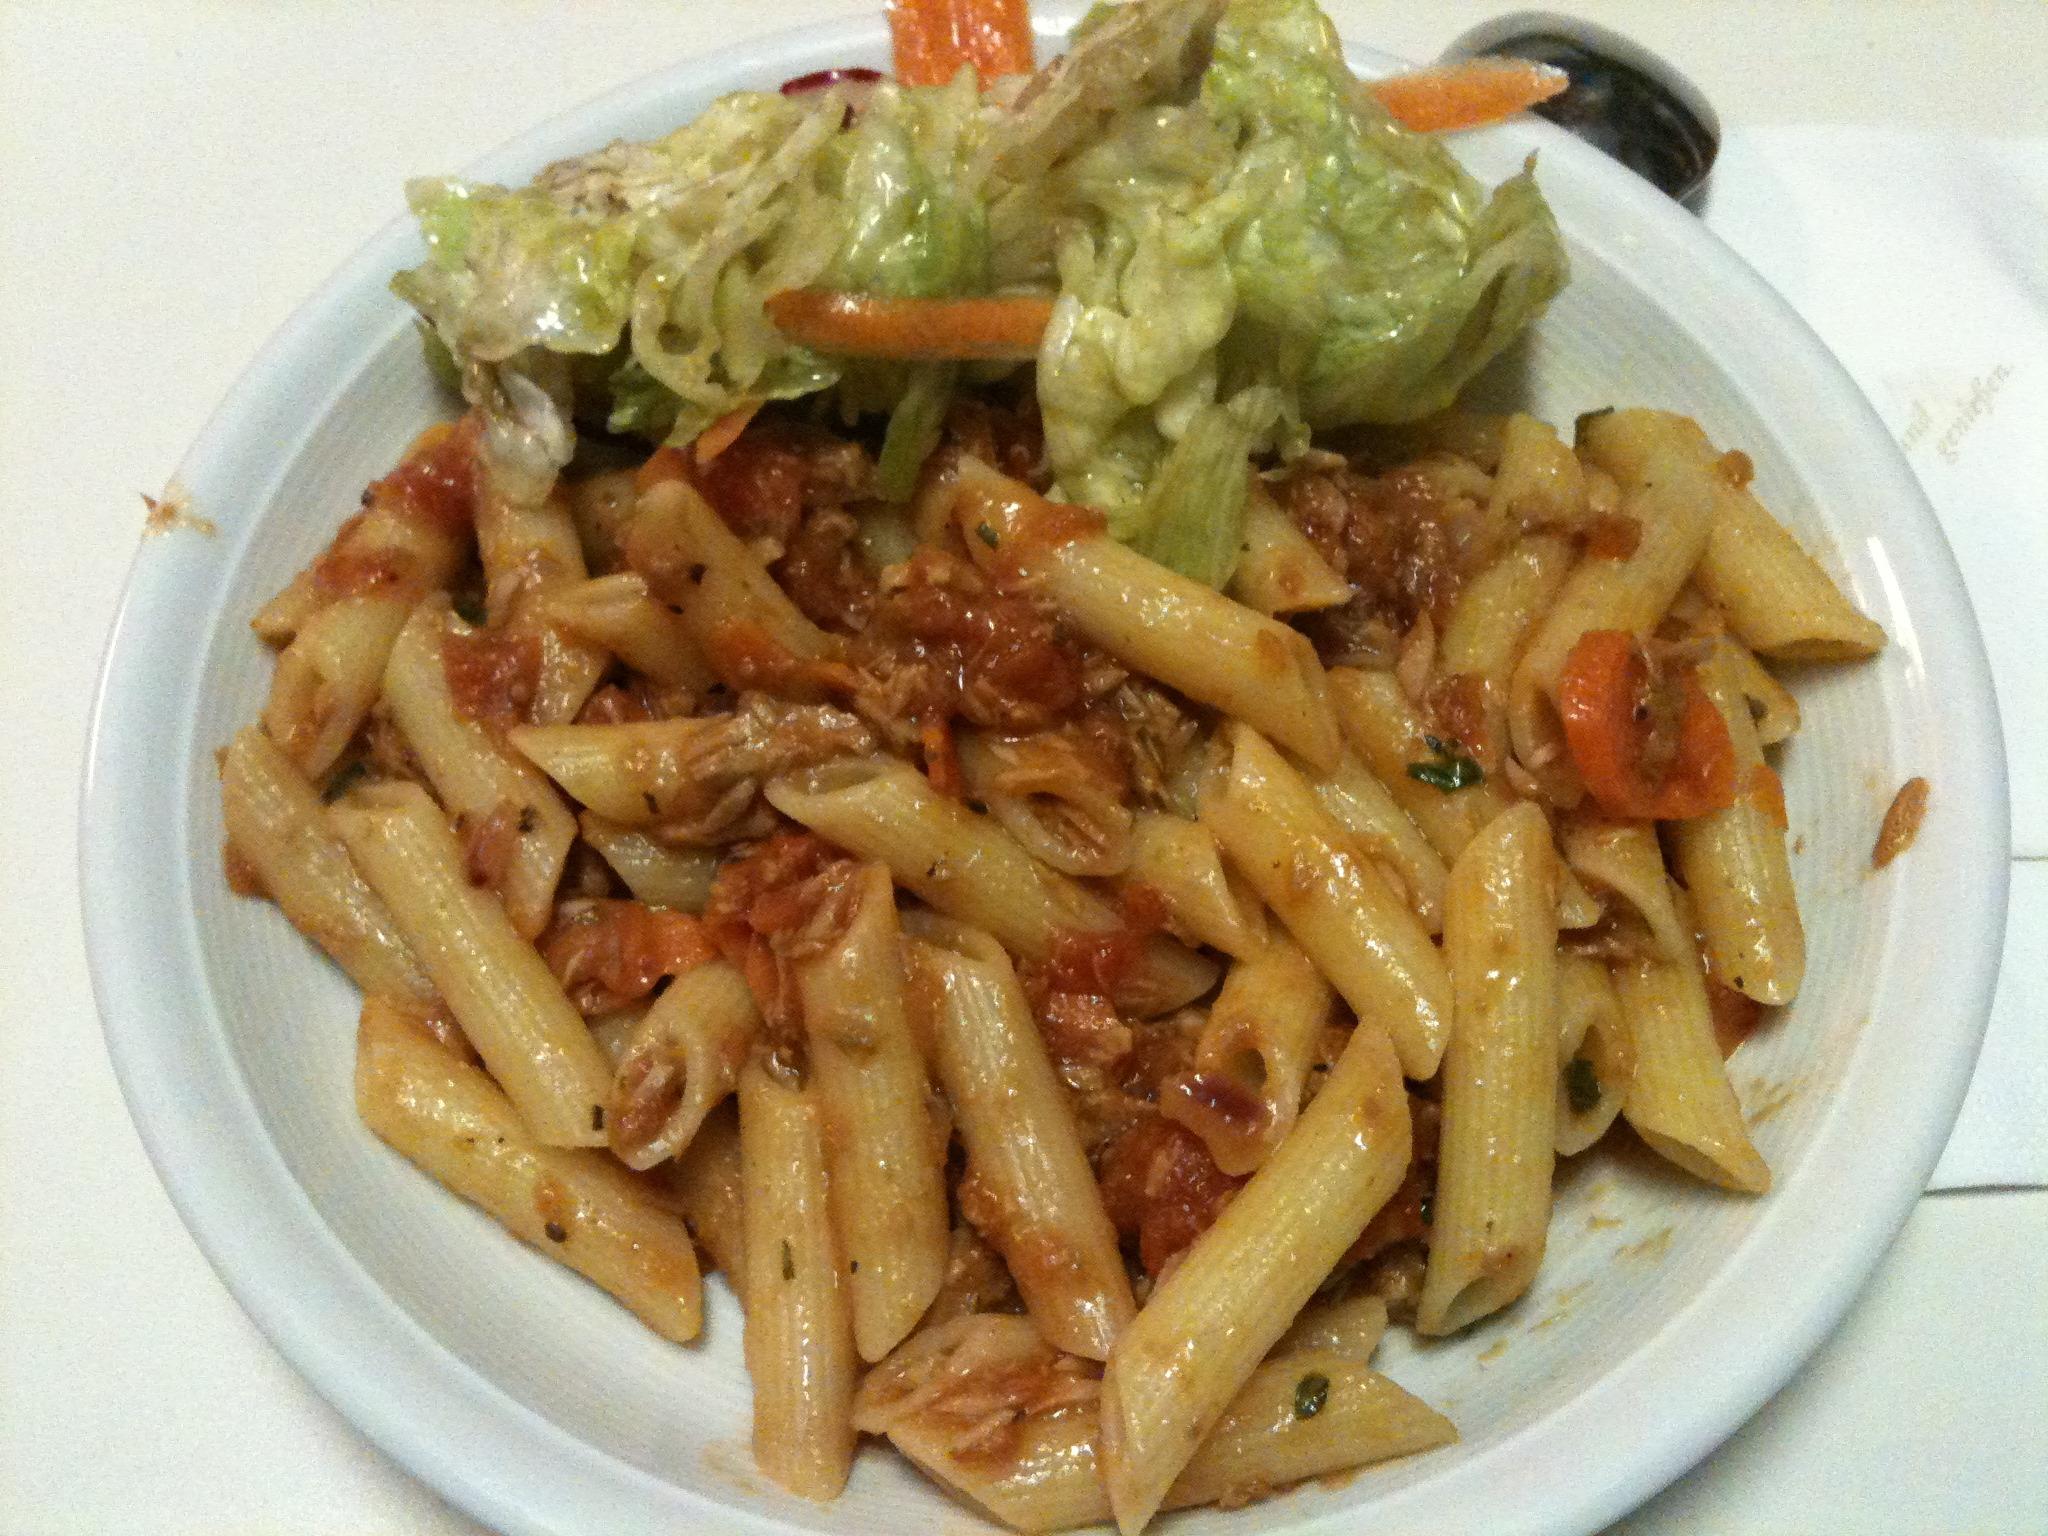 https://foodloader.net/nico_2013-01-26_penne-mit-thunfisch-tomaten-sauce.jpg